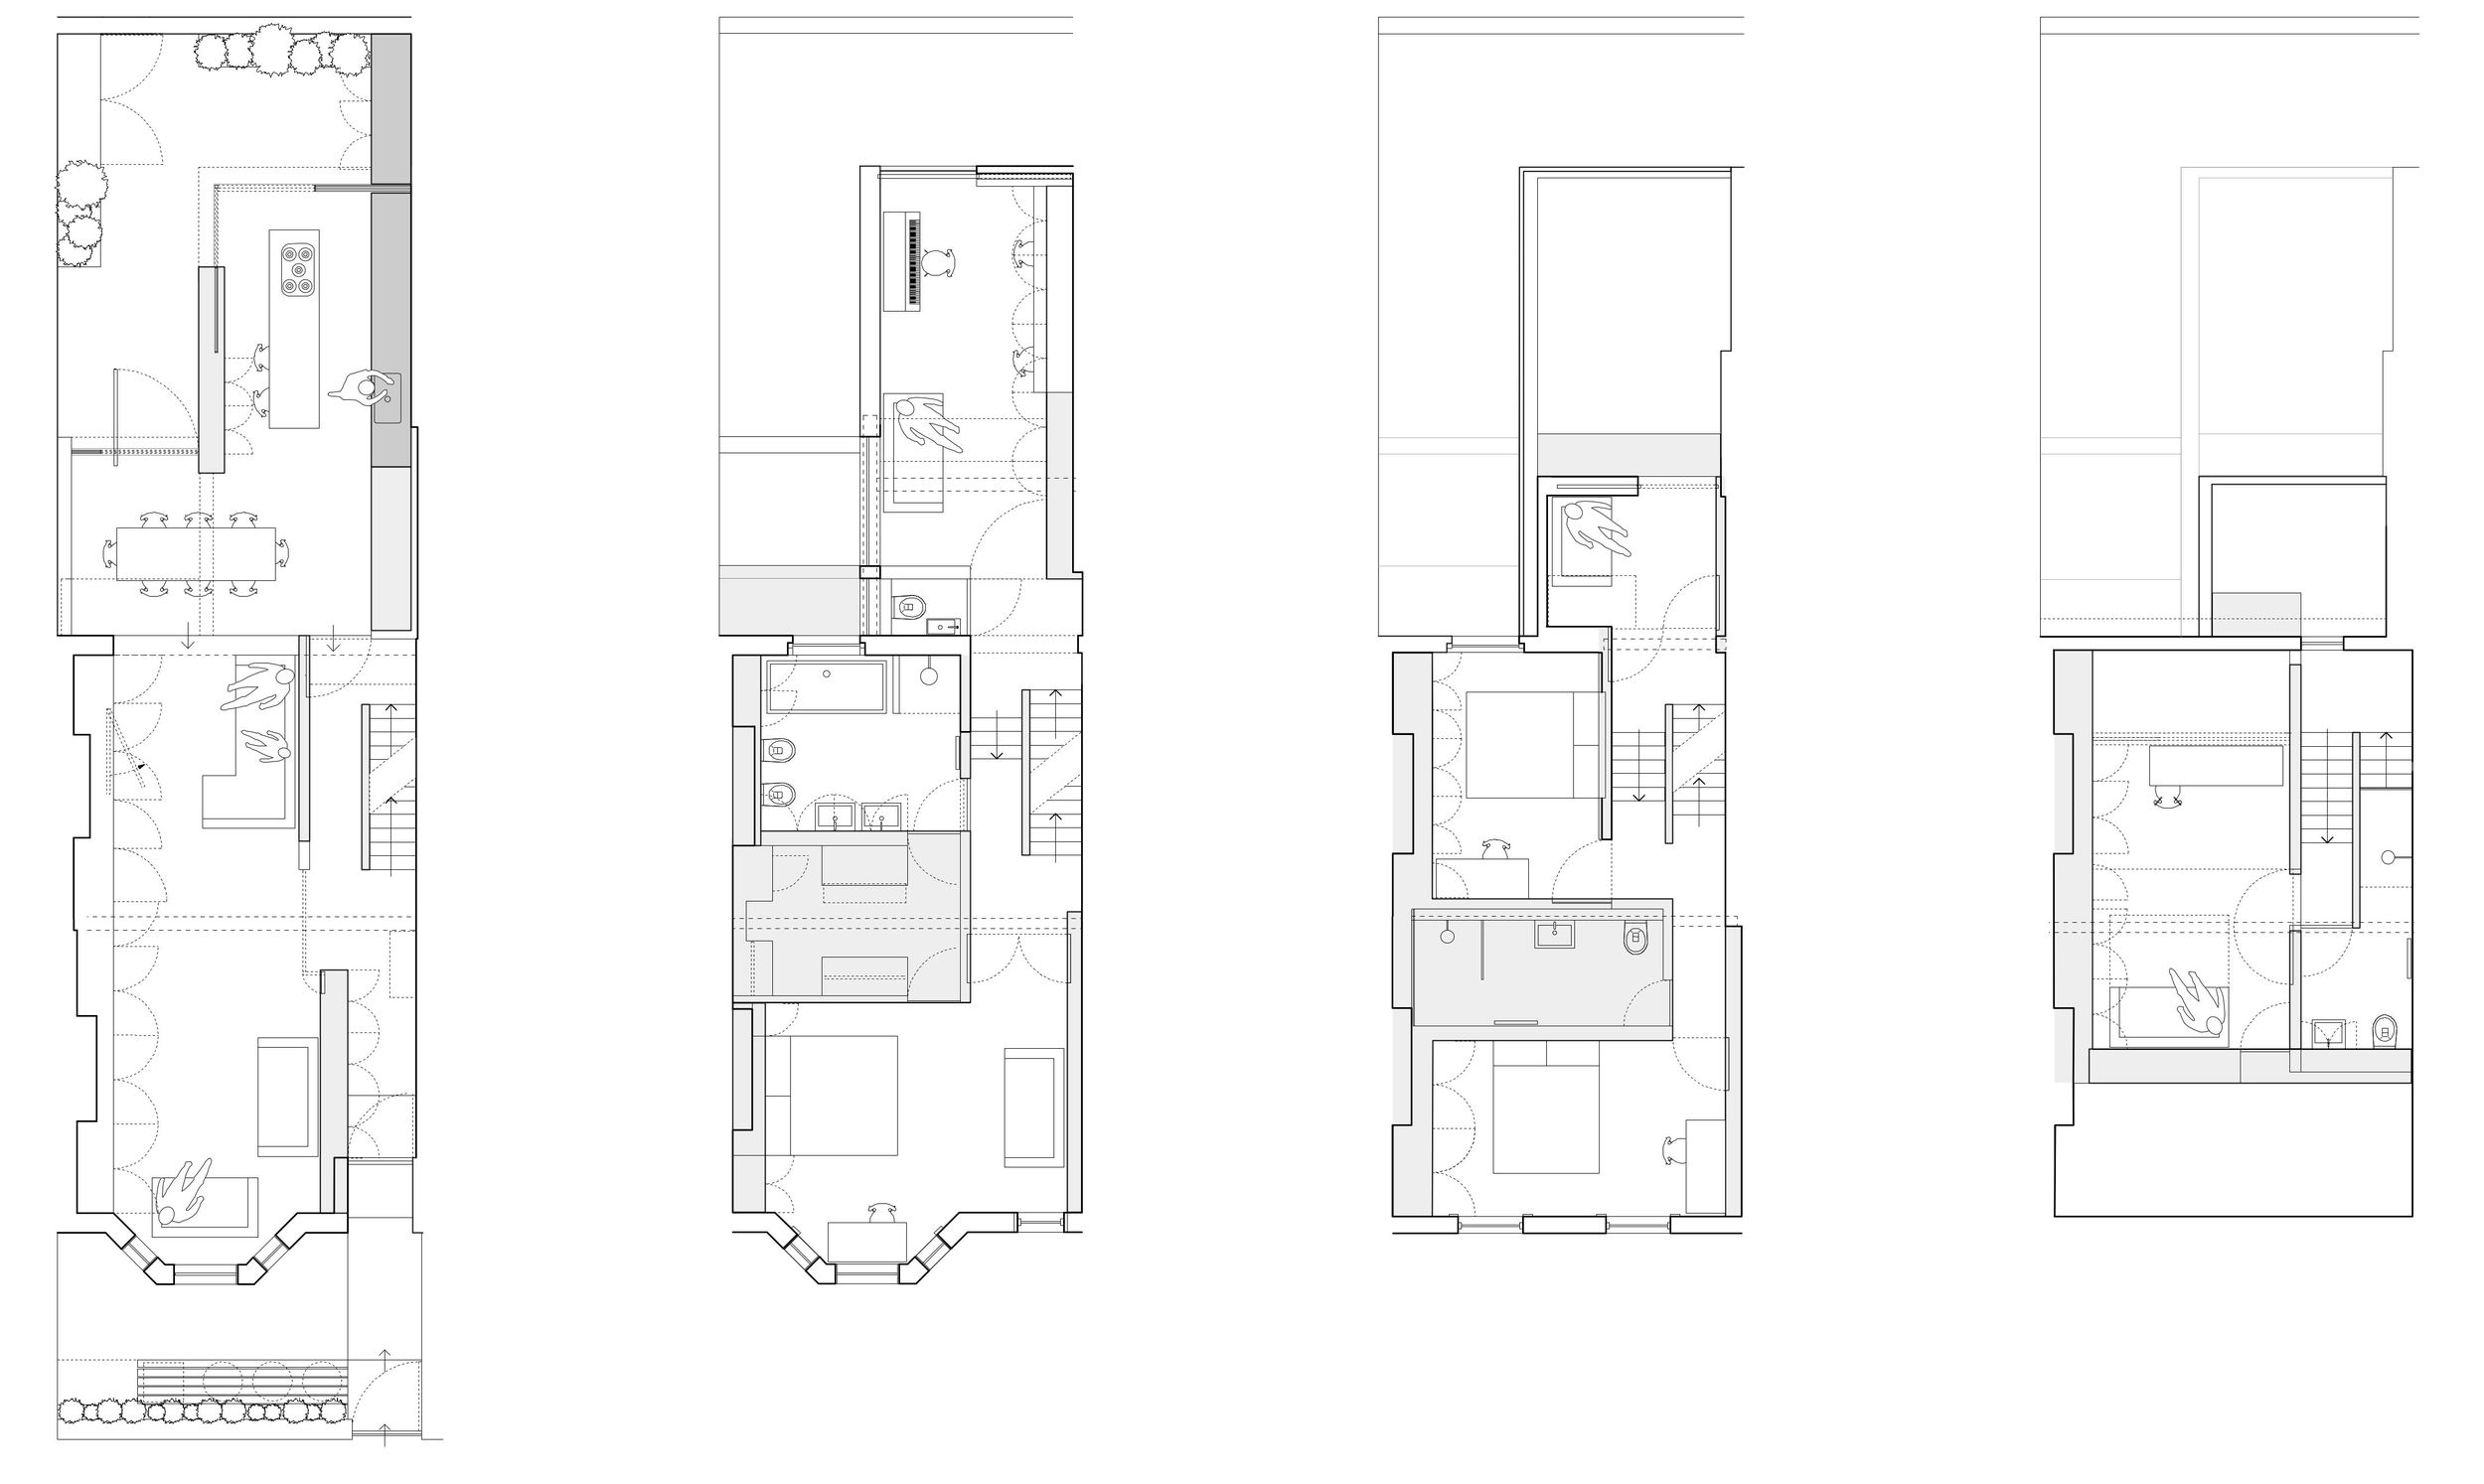 WilliamTozer_StackHouse_Plans